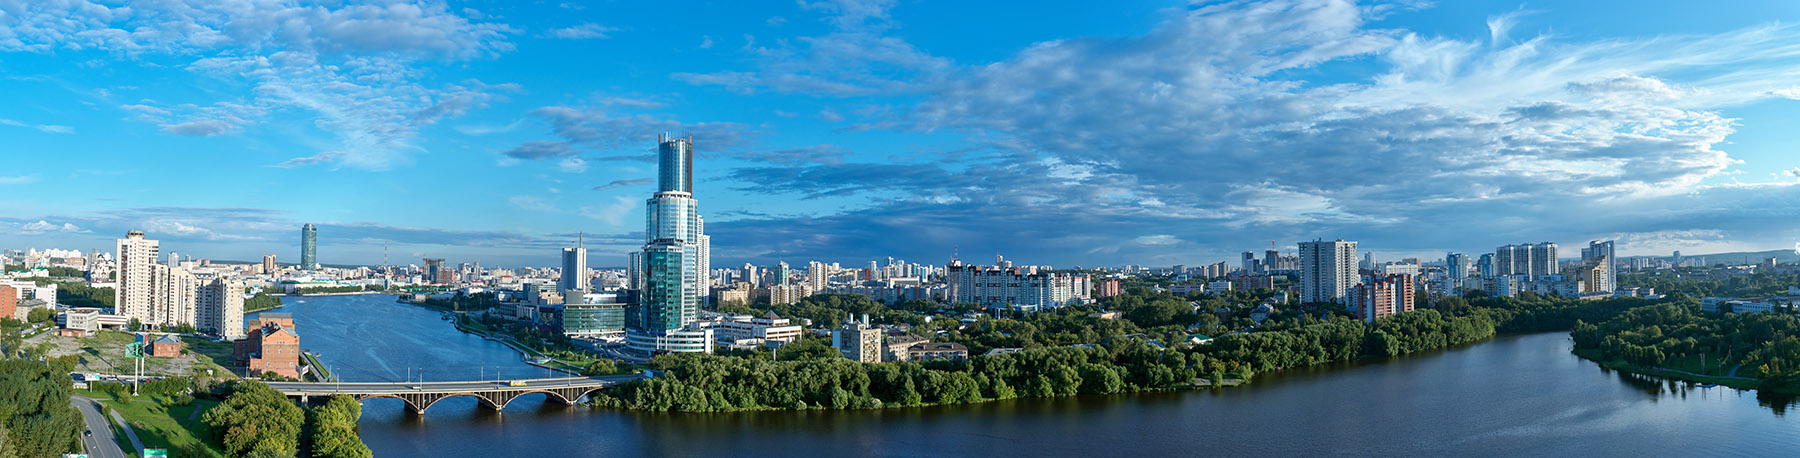 Панорамная архитектурная съемка Екатеринбурга